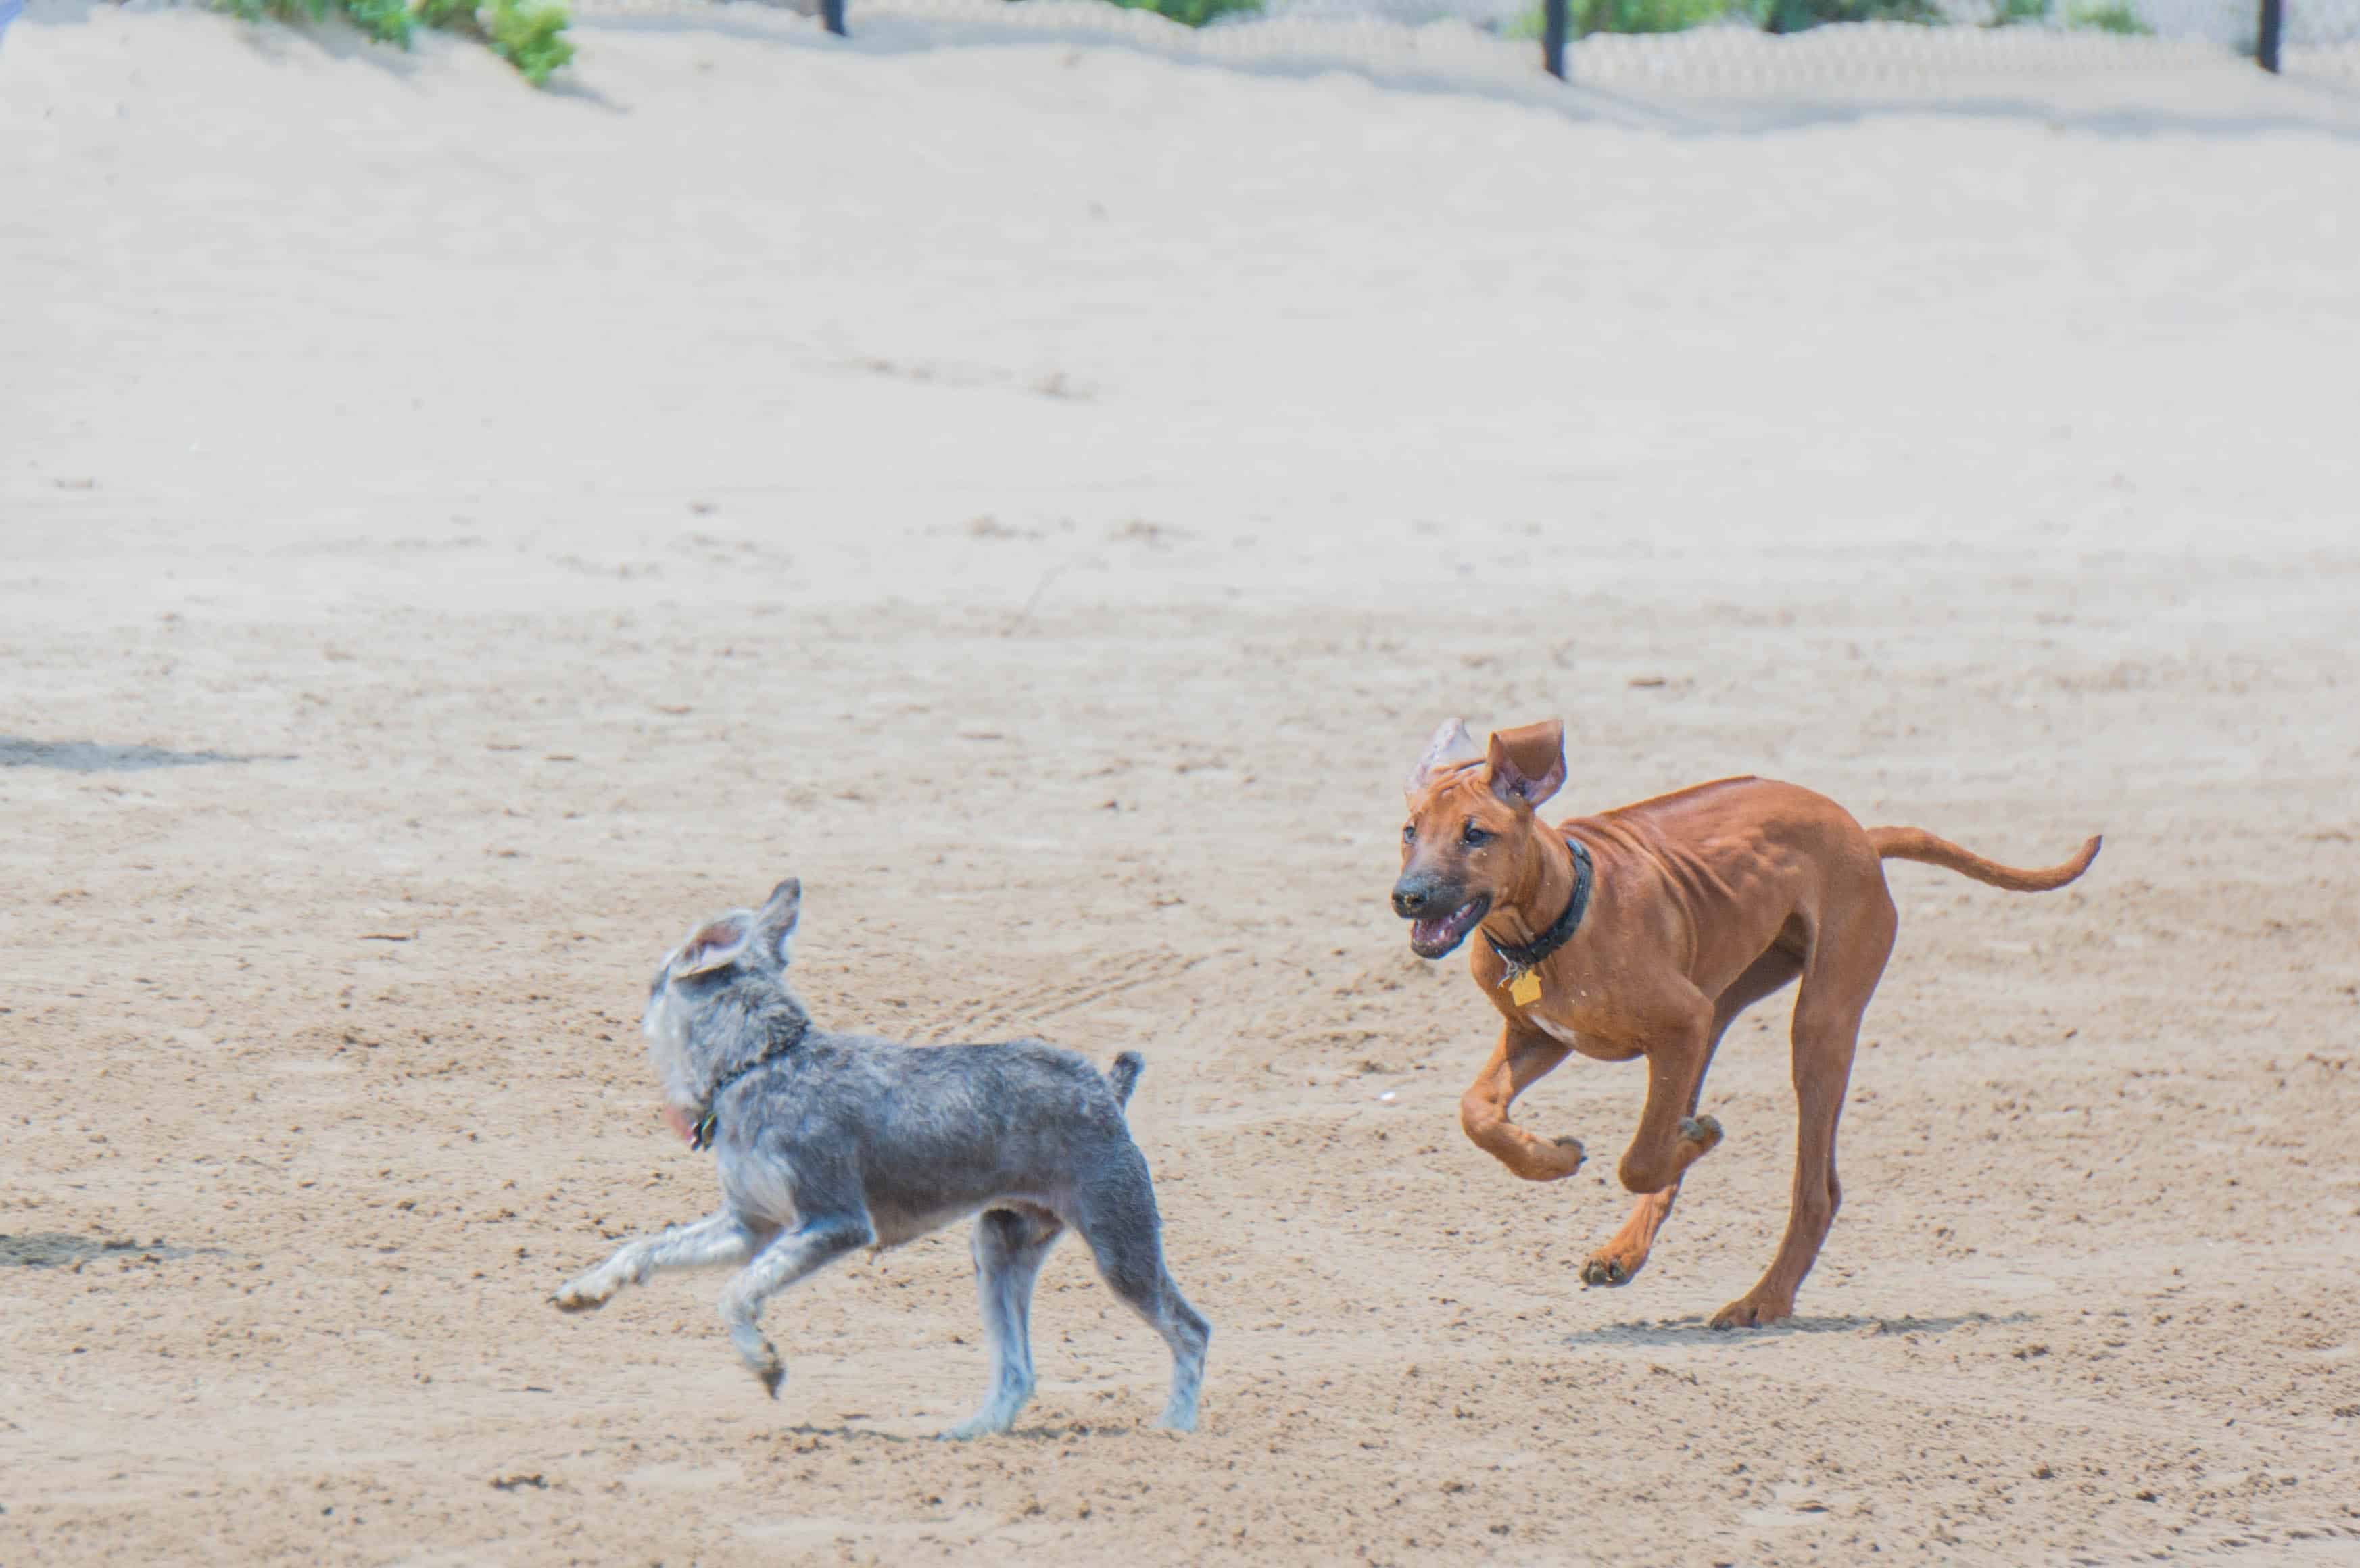 Rhodesian Ridgeback, puppy, dog beach, chicago, adventure, marking our territory